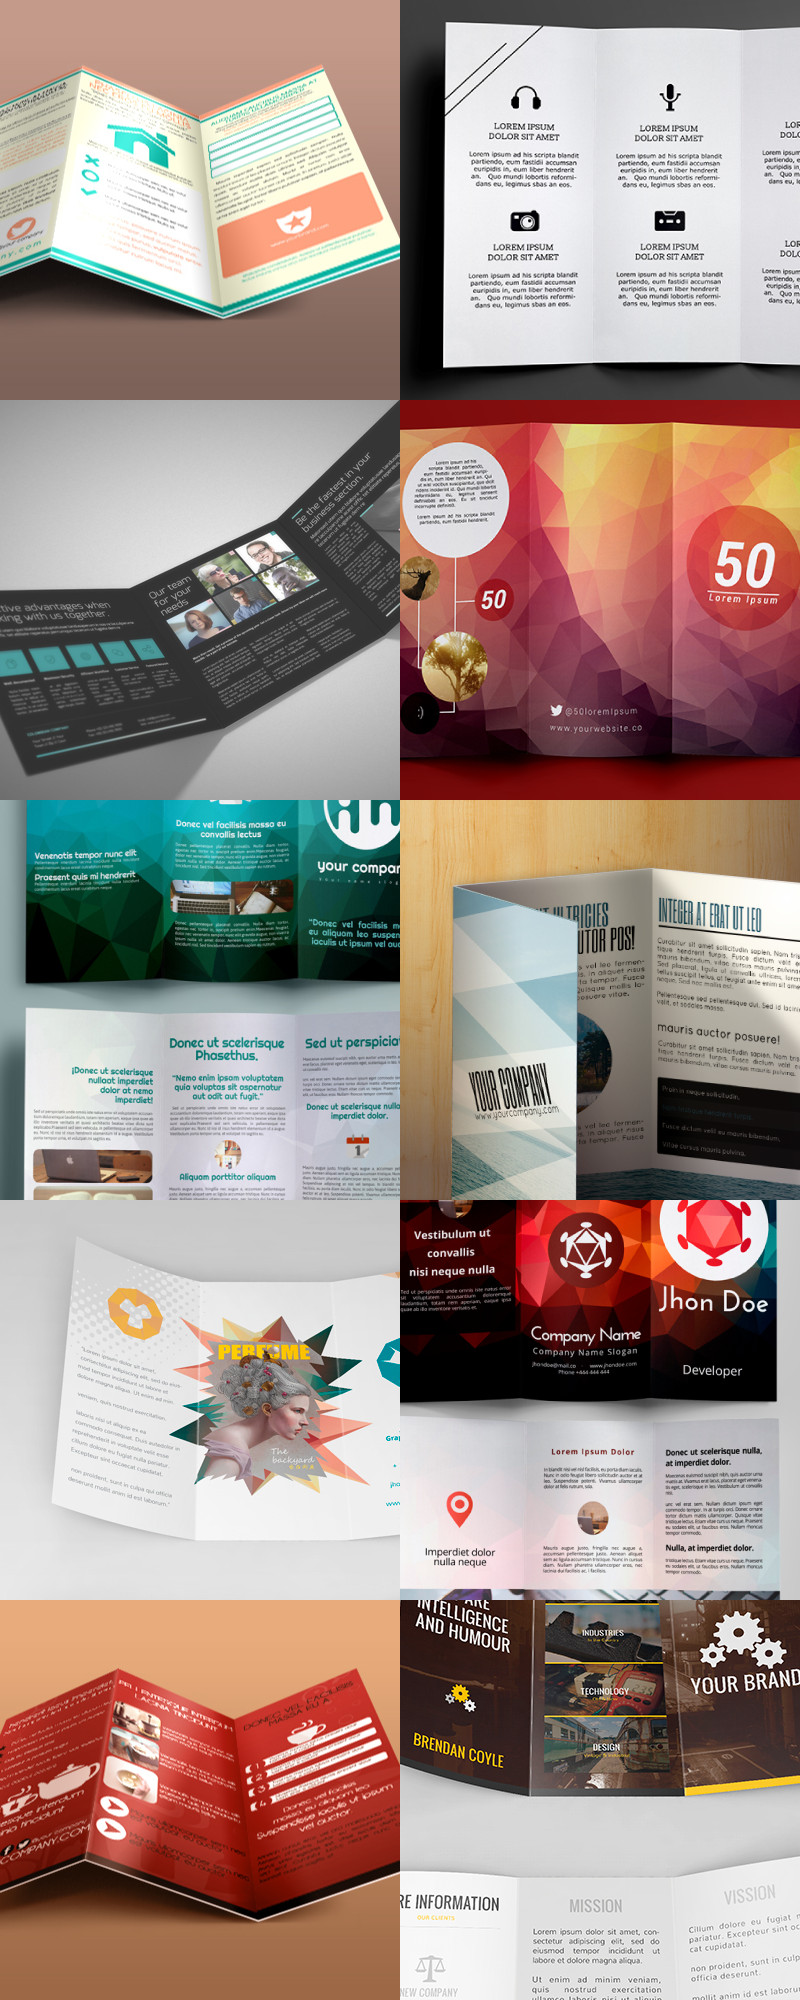 Tri Fold Brochure Template Illustrator 25 Editable Illustrator Tri Fold Brochure Templates bypeople